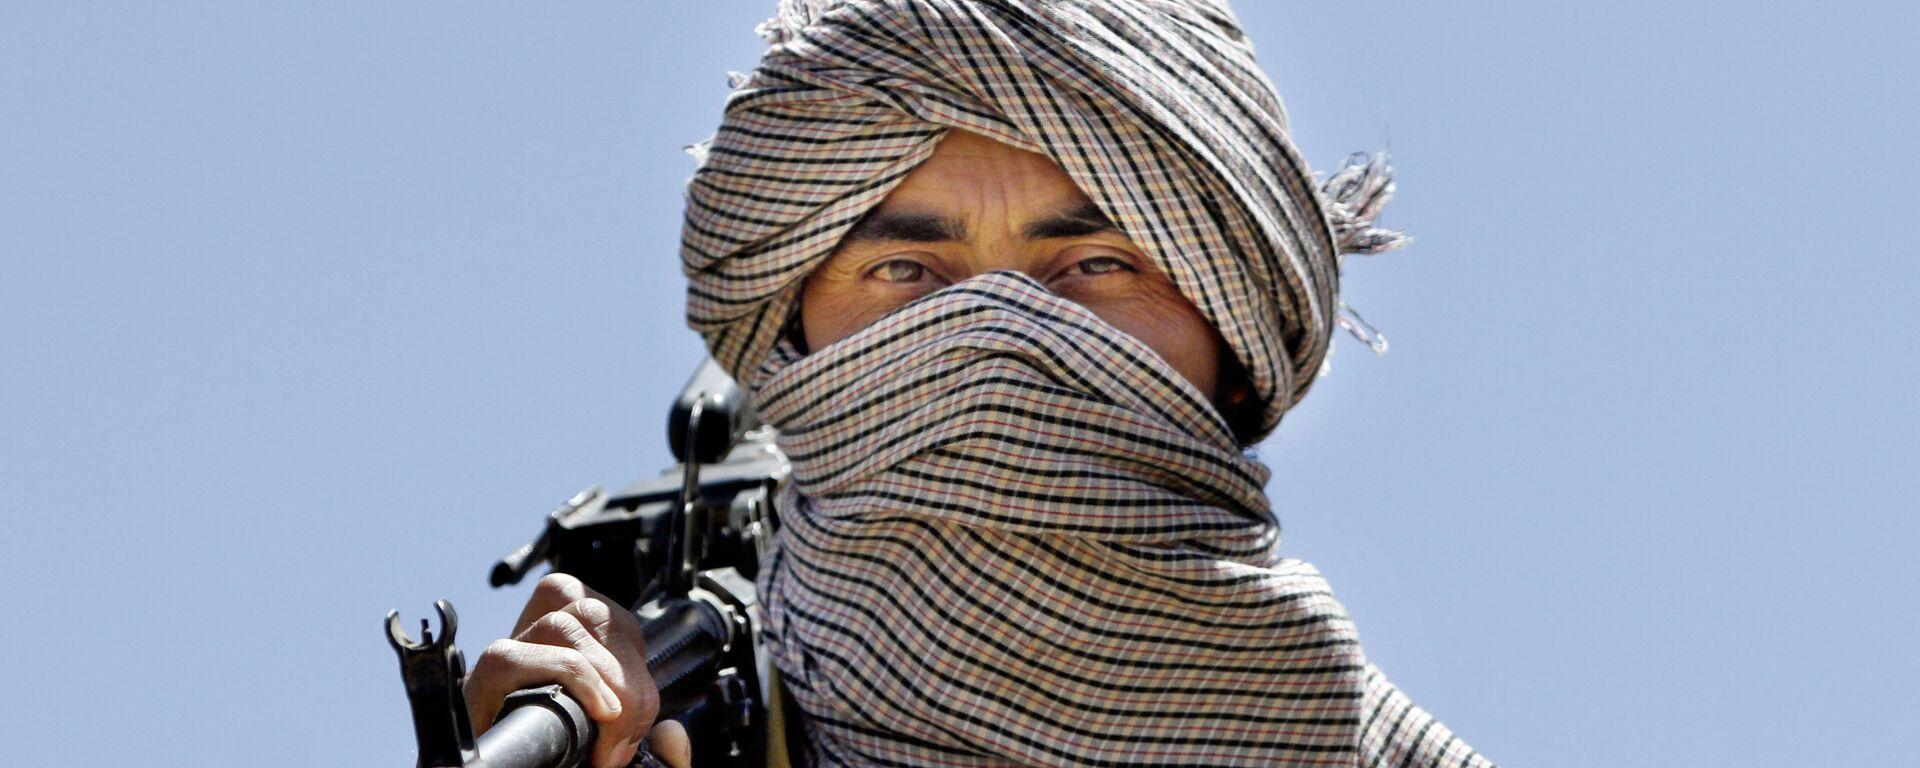 Член террористической организации Талибан в Афганистане - Sputnik Таджикистан, 1920, 23.06.2021